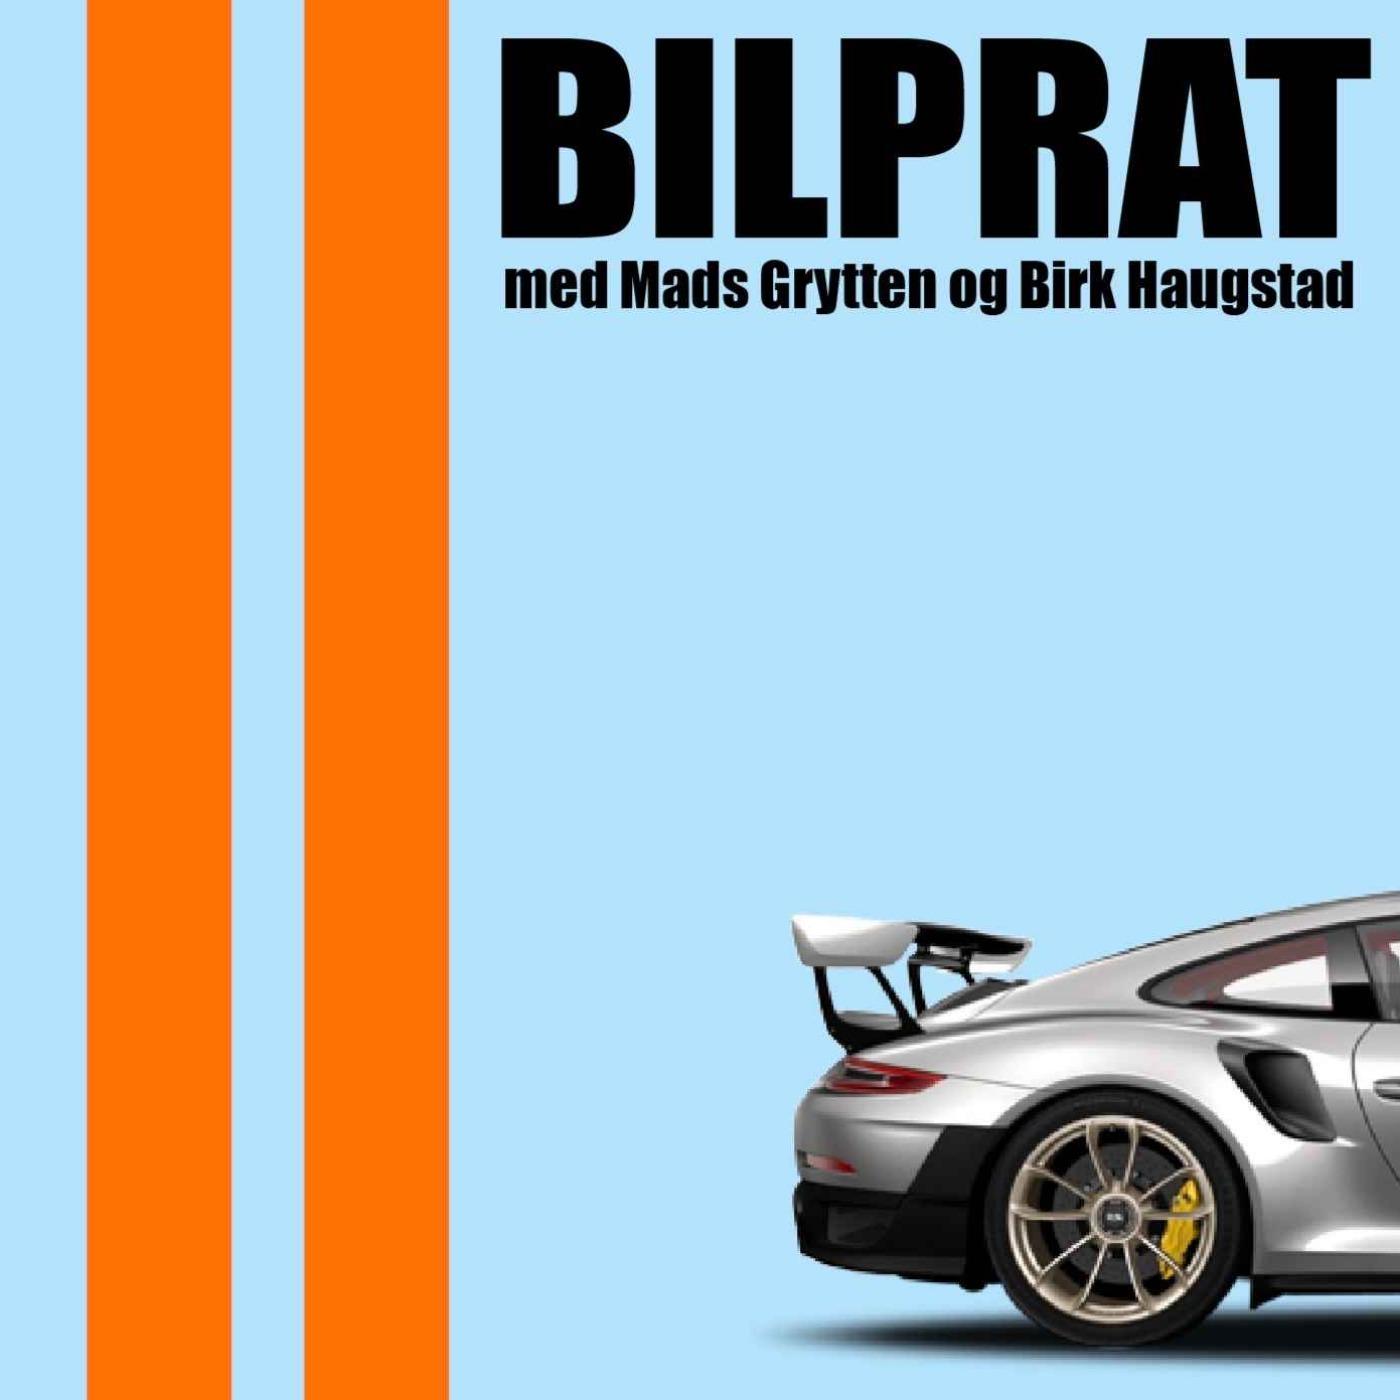 17 - DEL 1 av BMW Podcasten. Historie, racing, hva synes vi?